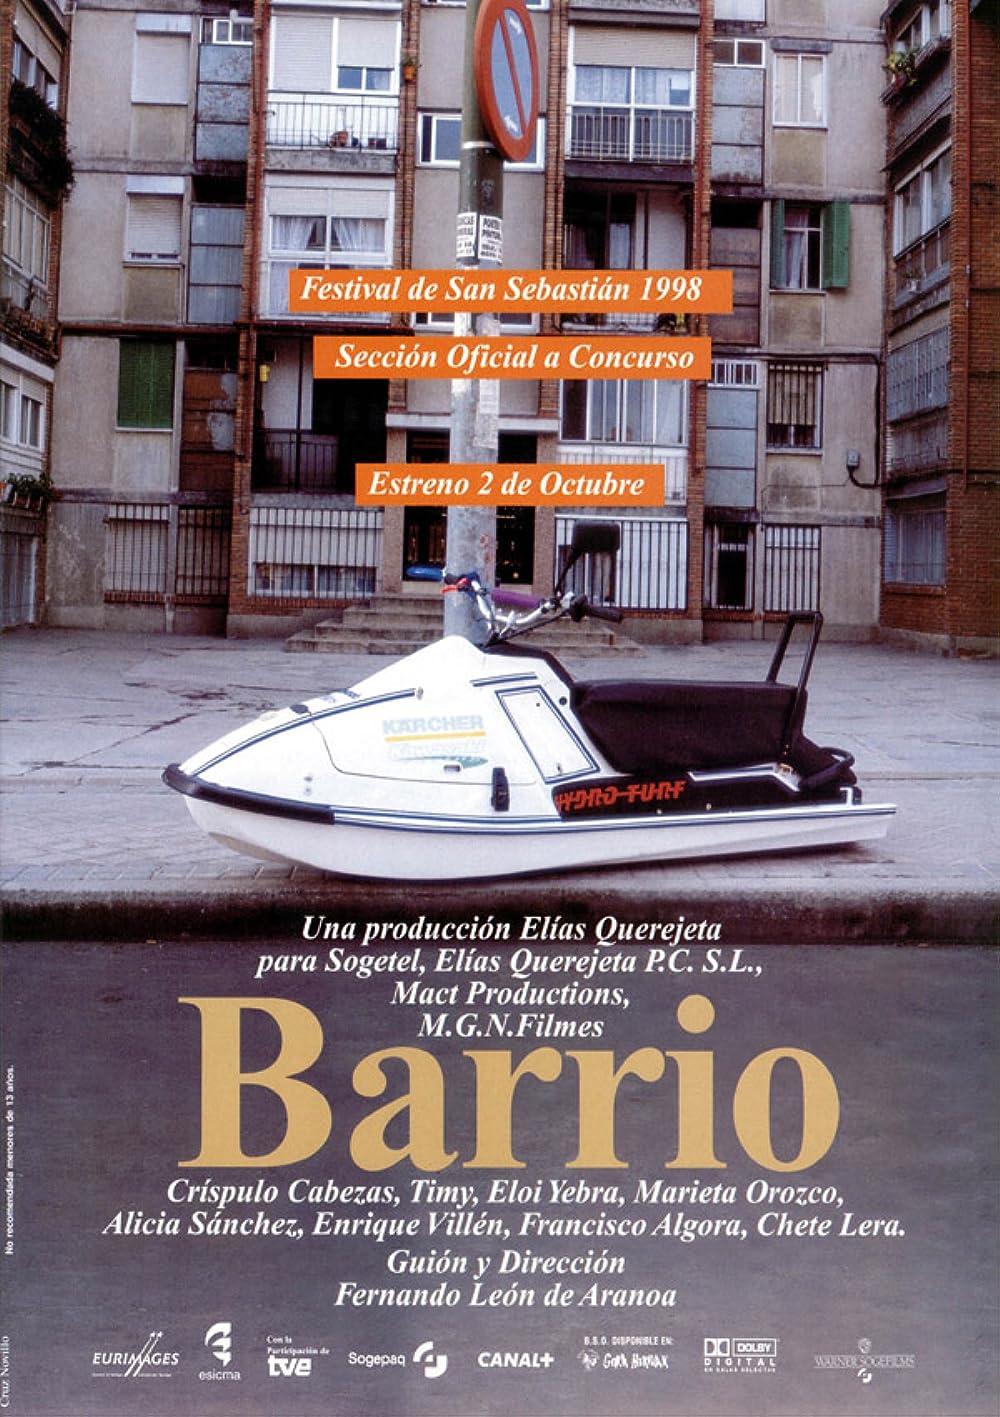 Barrio 1998 Imdb